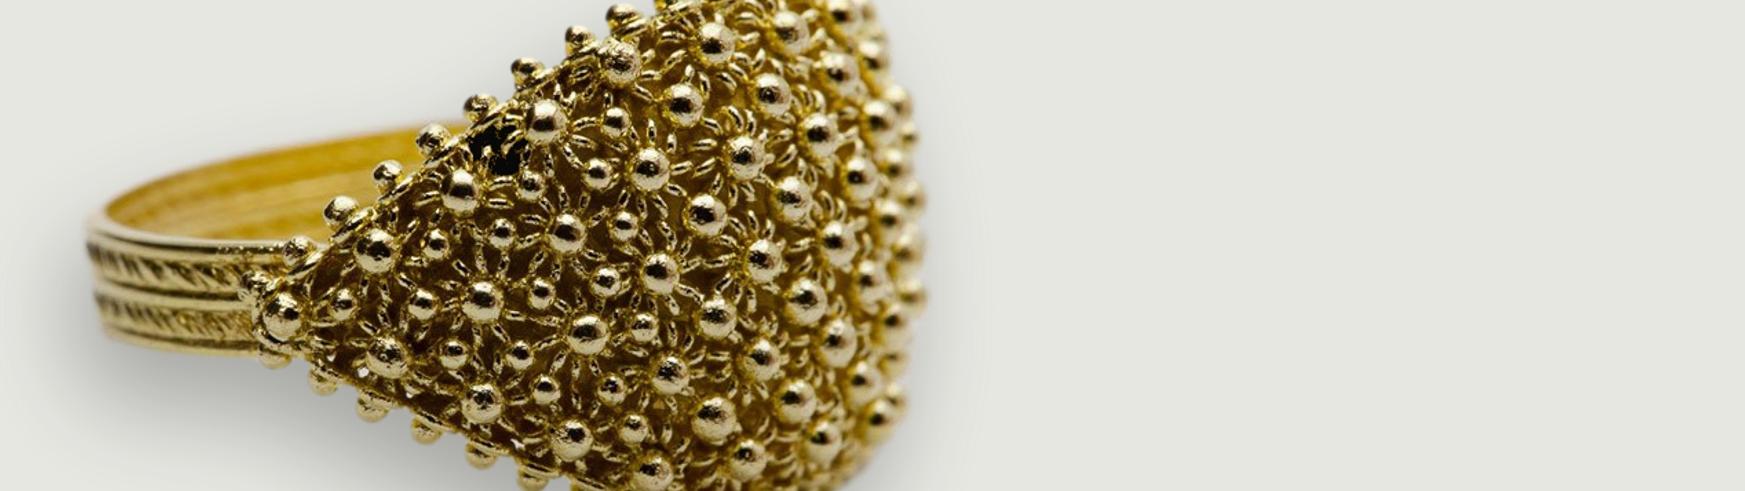 Fede sarda a nido d'ape realizzata a mano